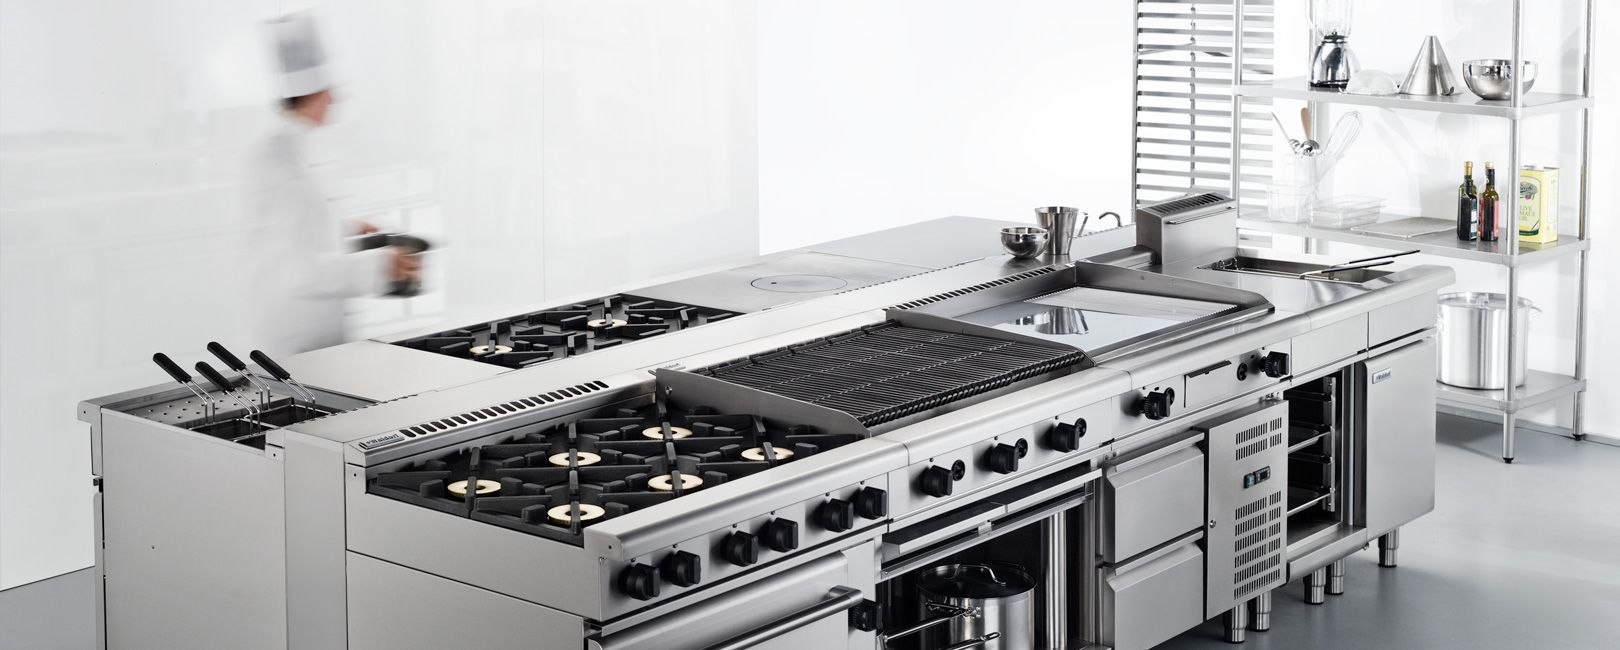 Vlevle-graphicdesign-kitchen_concept-brand_identity